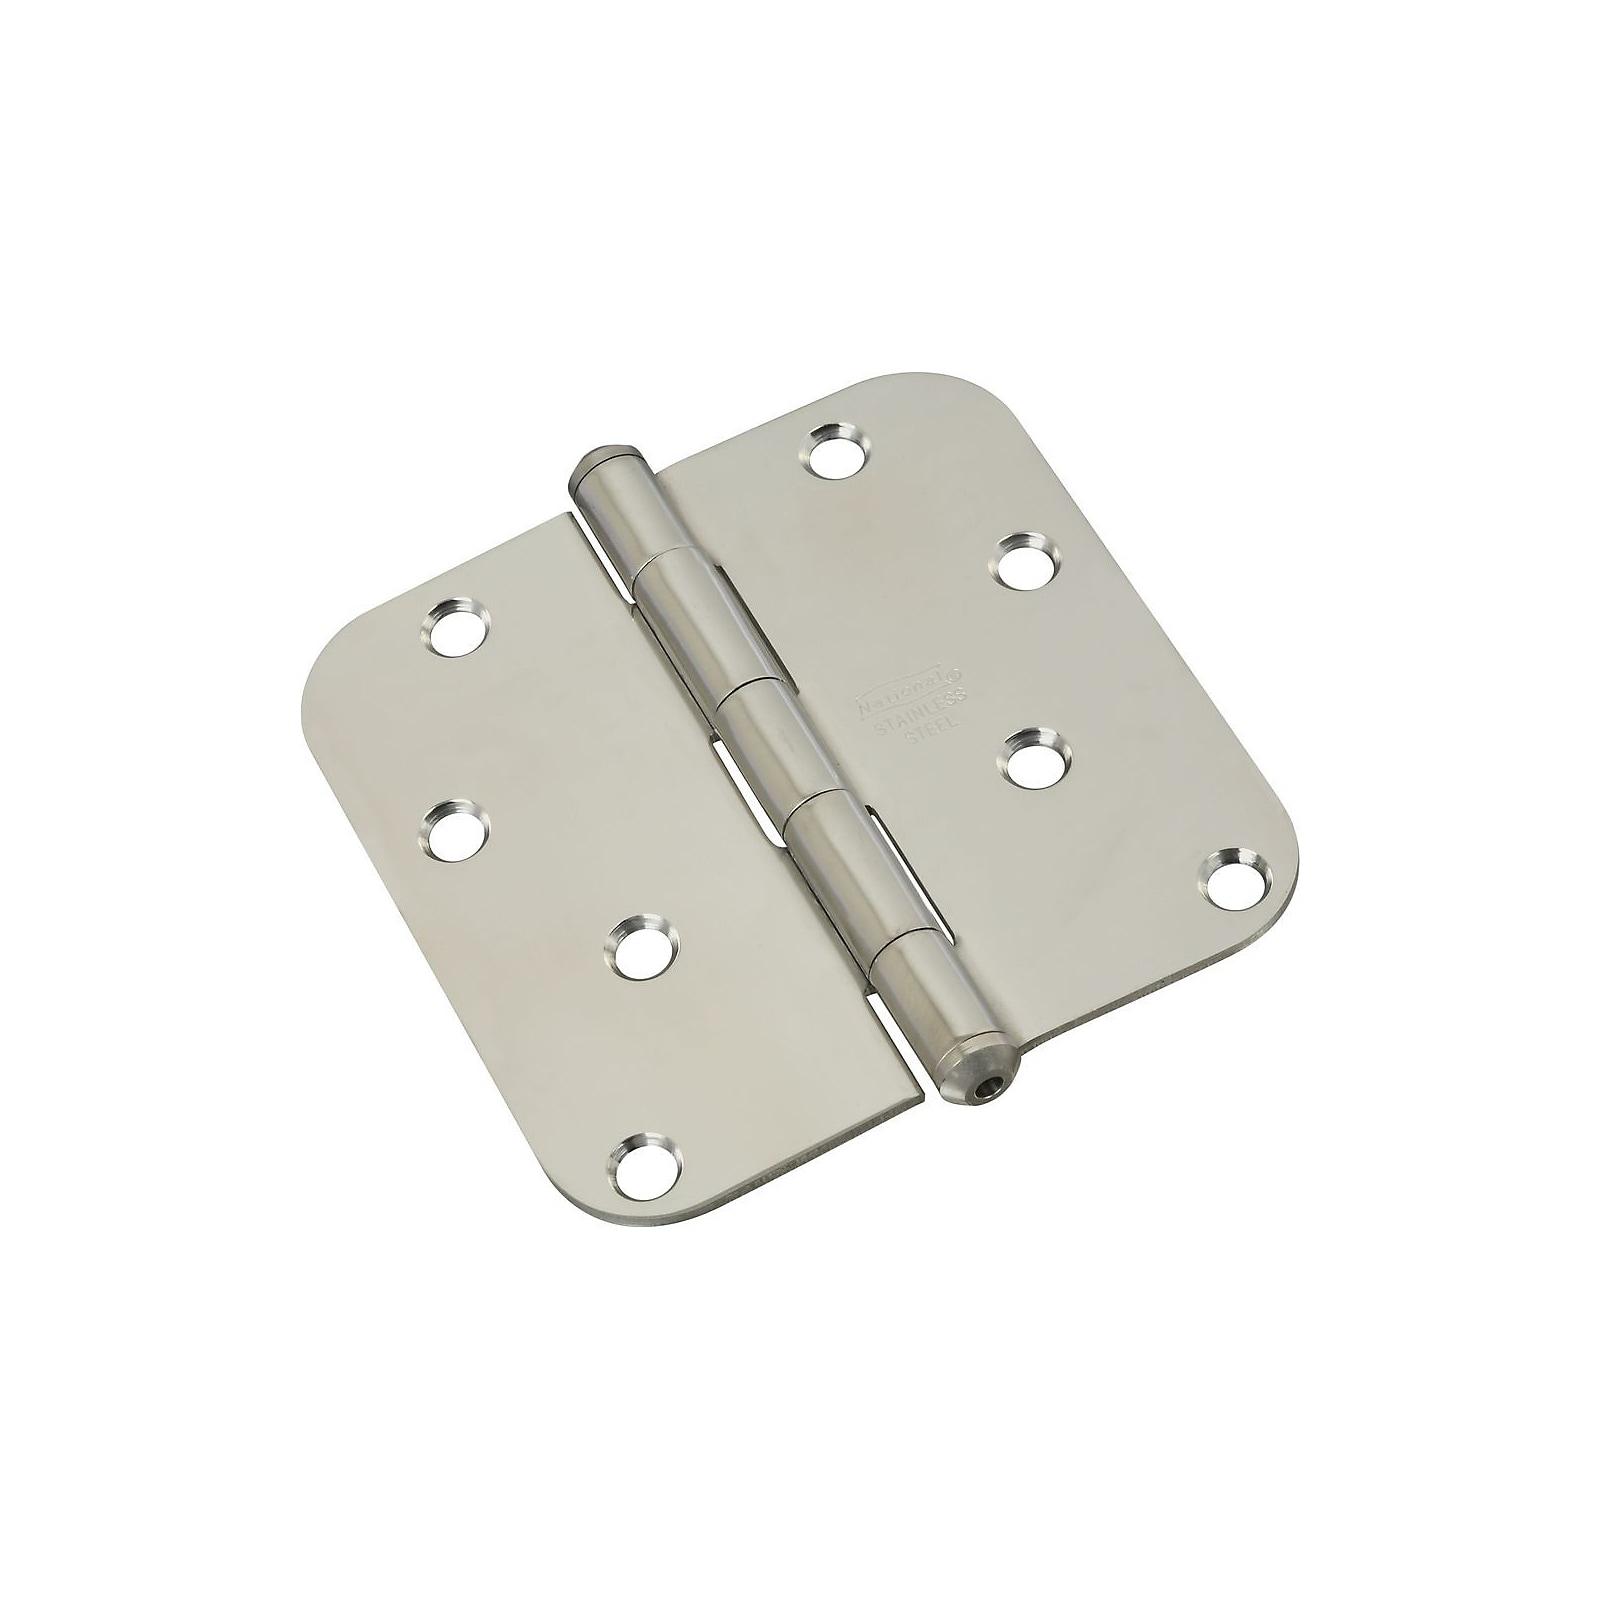 National Hardware 830270 Door Hinge, Stainless Steel, 4